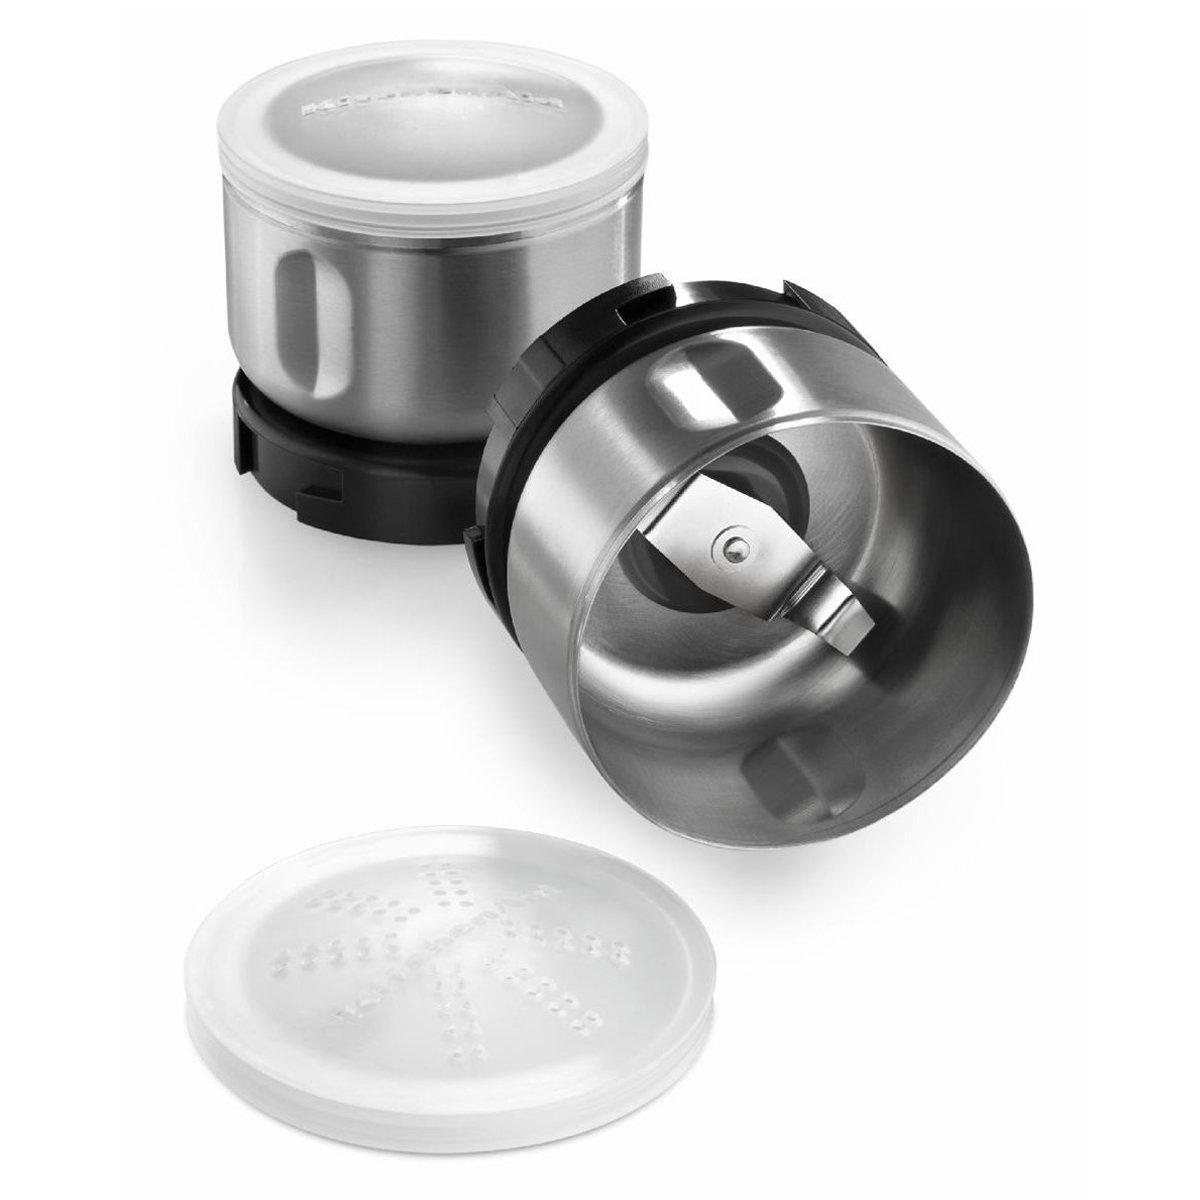 Kitchenaid 5akcg111ob Spice Coffee Grinder Appliances Online Maker Wiring Diagram